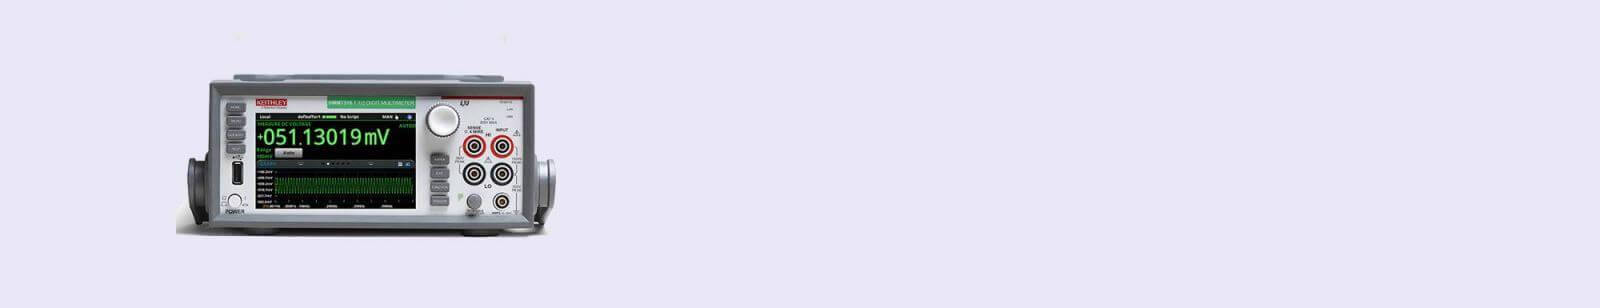 DMM7510 7 1/2 digites grafikus multiméter